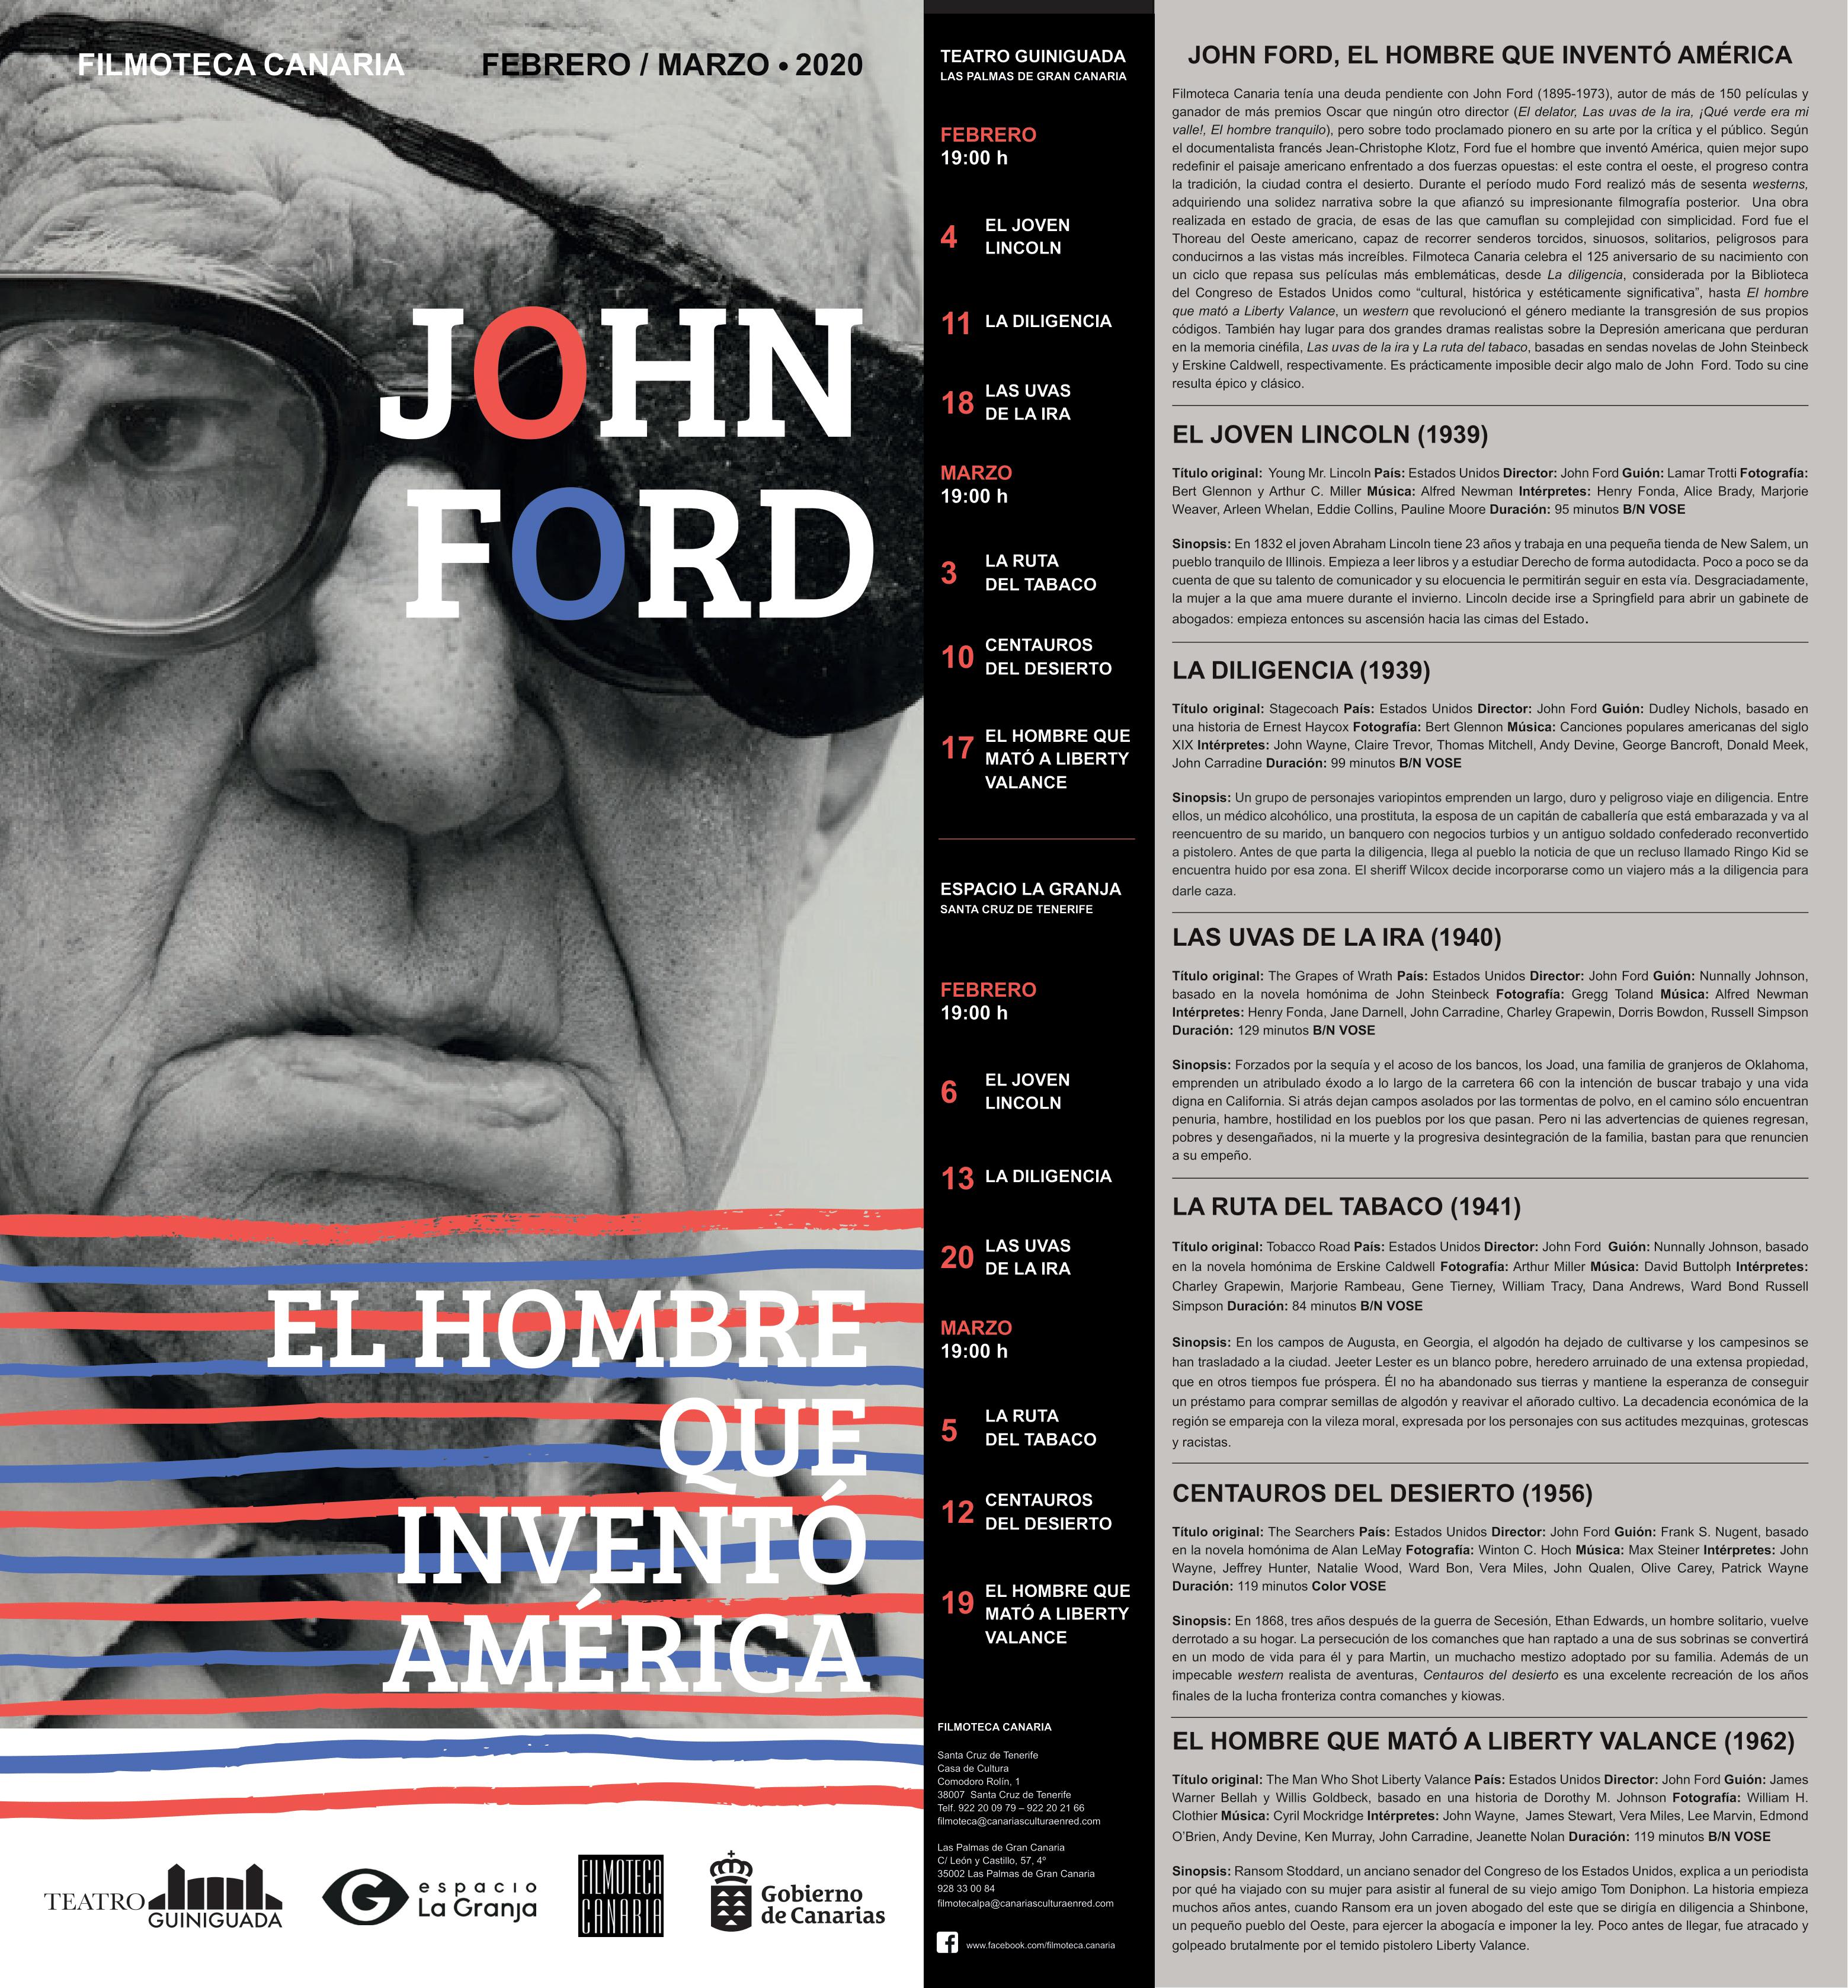 Ciclo John Ford filmoteca canaria granja santa cruz febrero marzo 2020